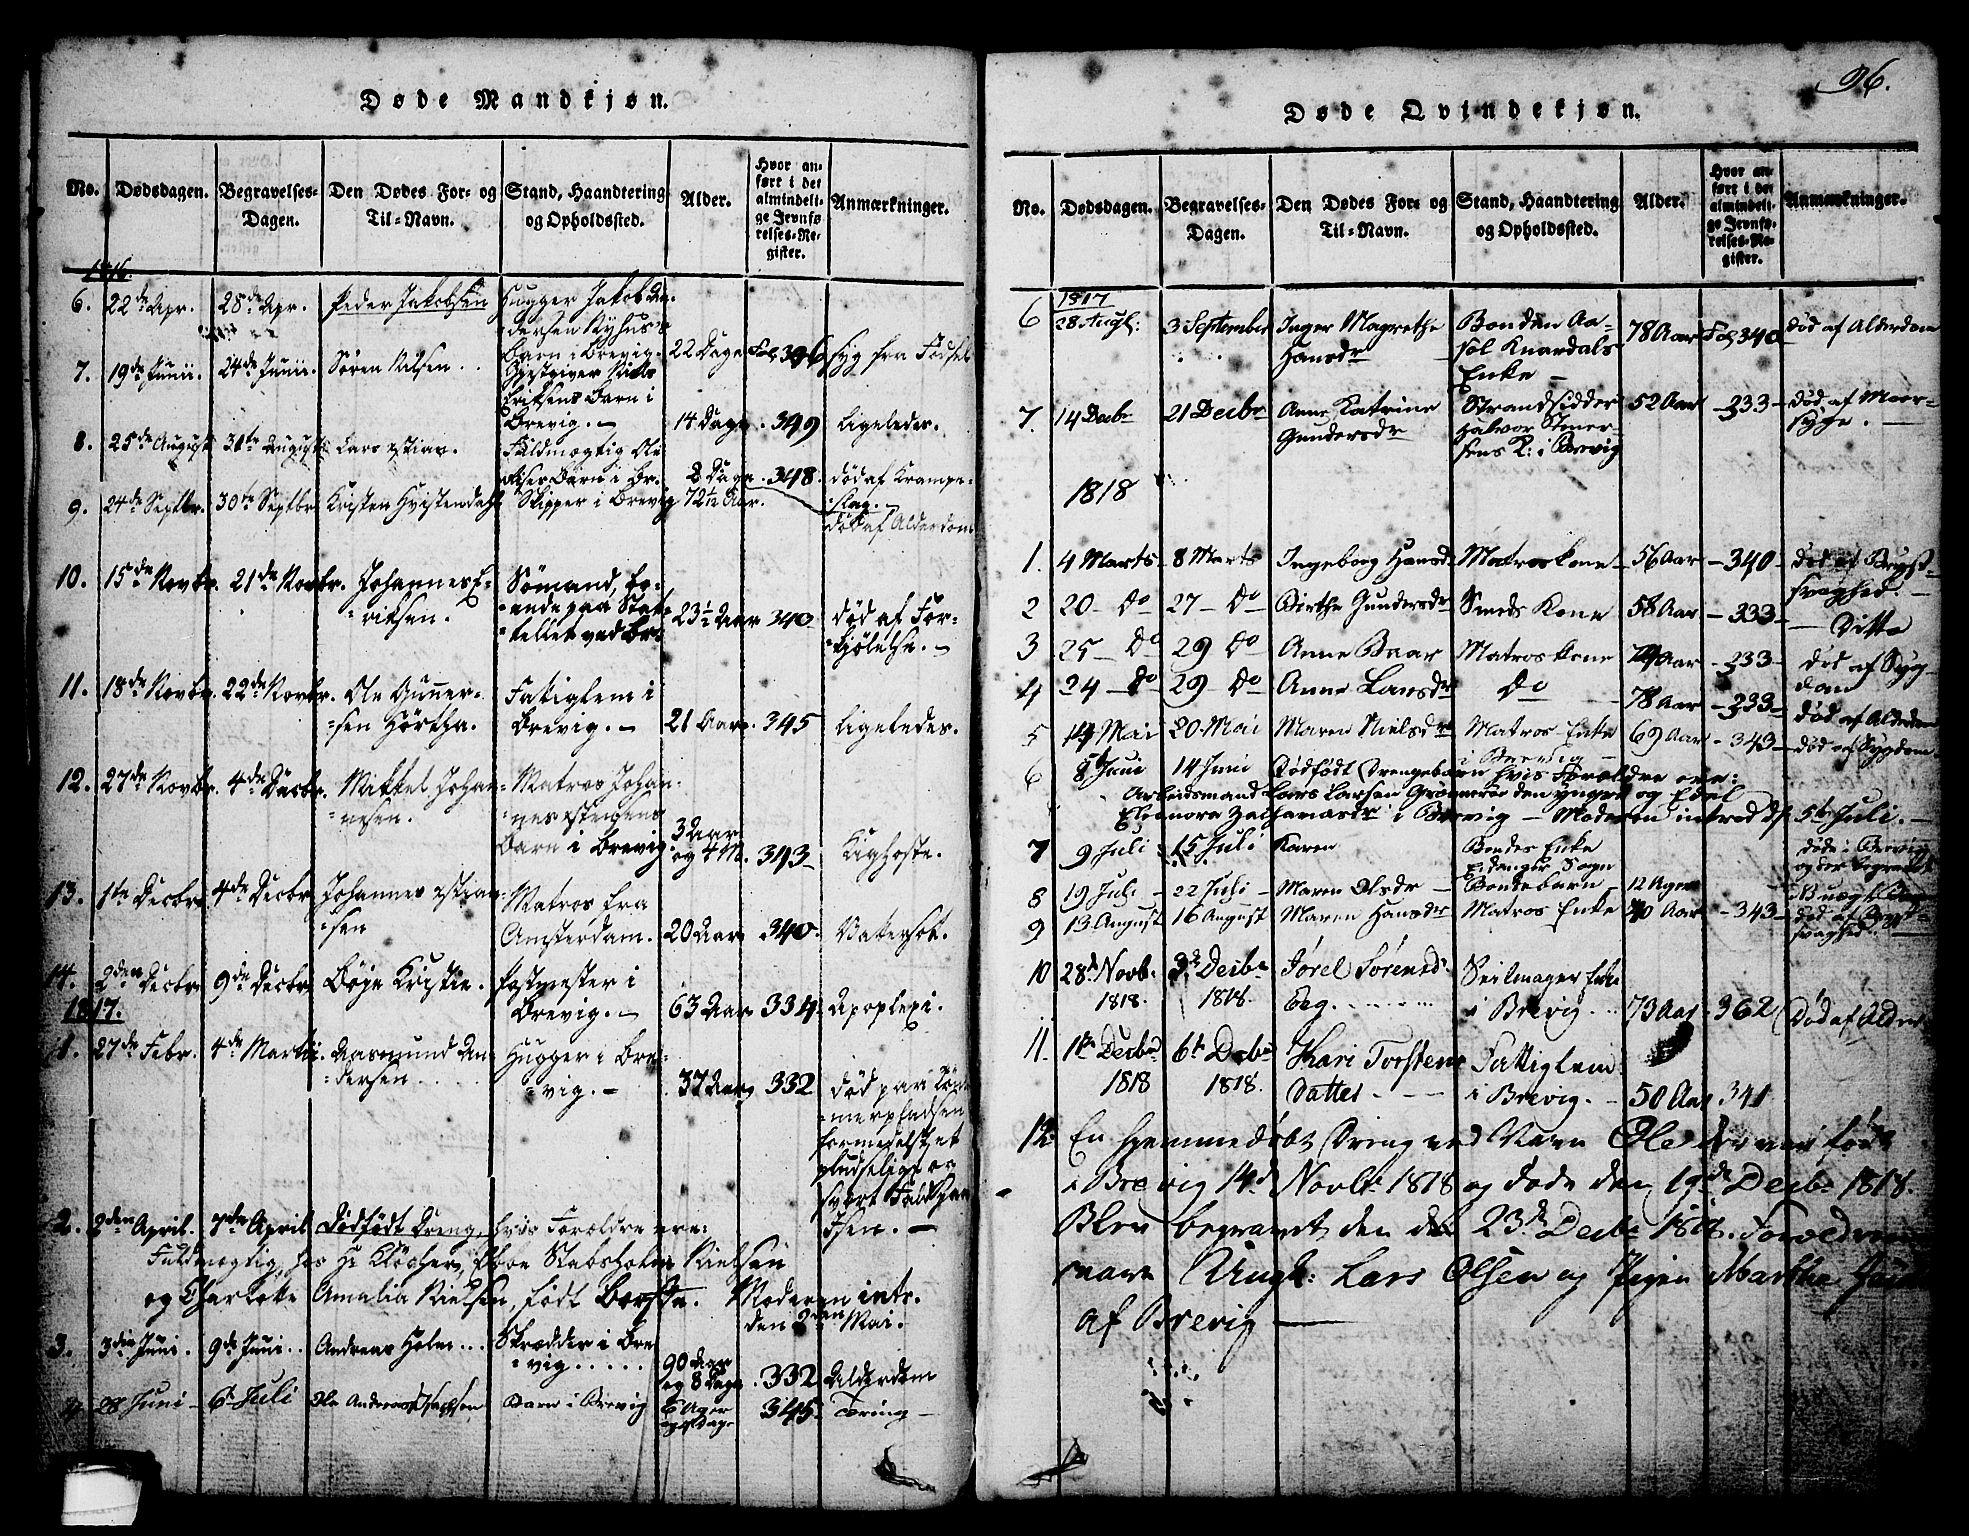 SAKO, Brevik kirkebøker, G/Ga/L0001: Klokkerbok nr. 1, 1814-1845, s. 96